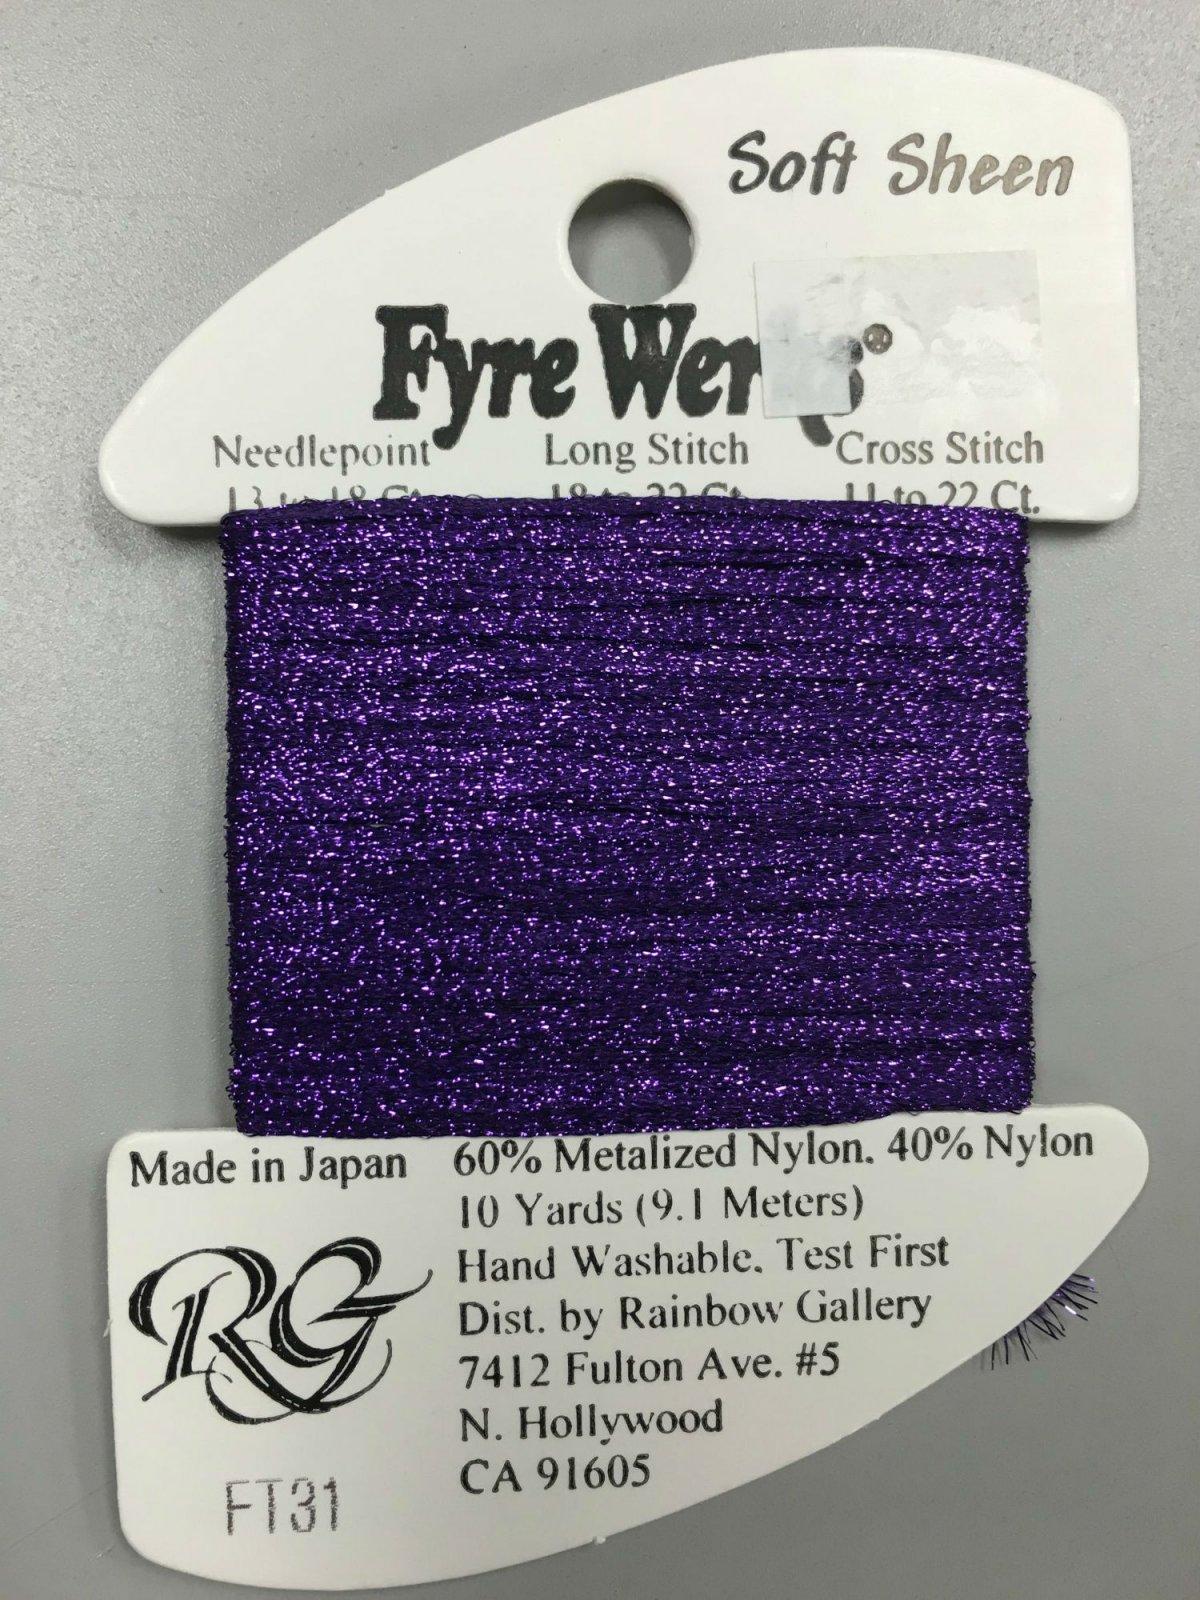 Fyre Werks Soft Sheen FT31